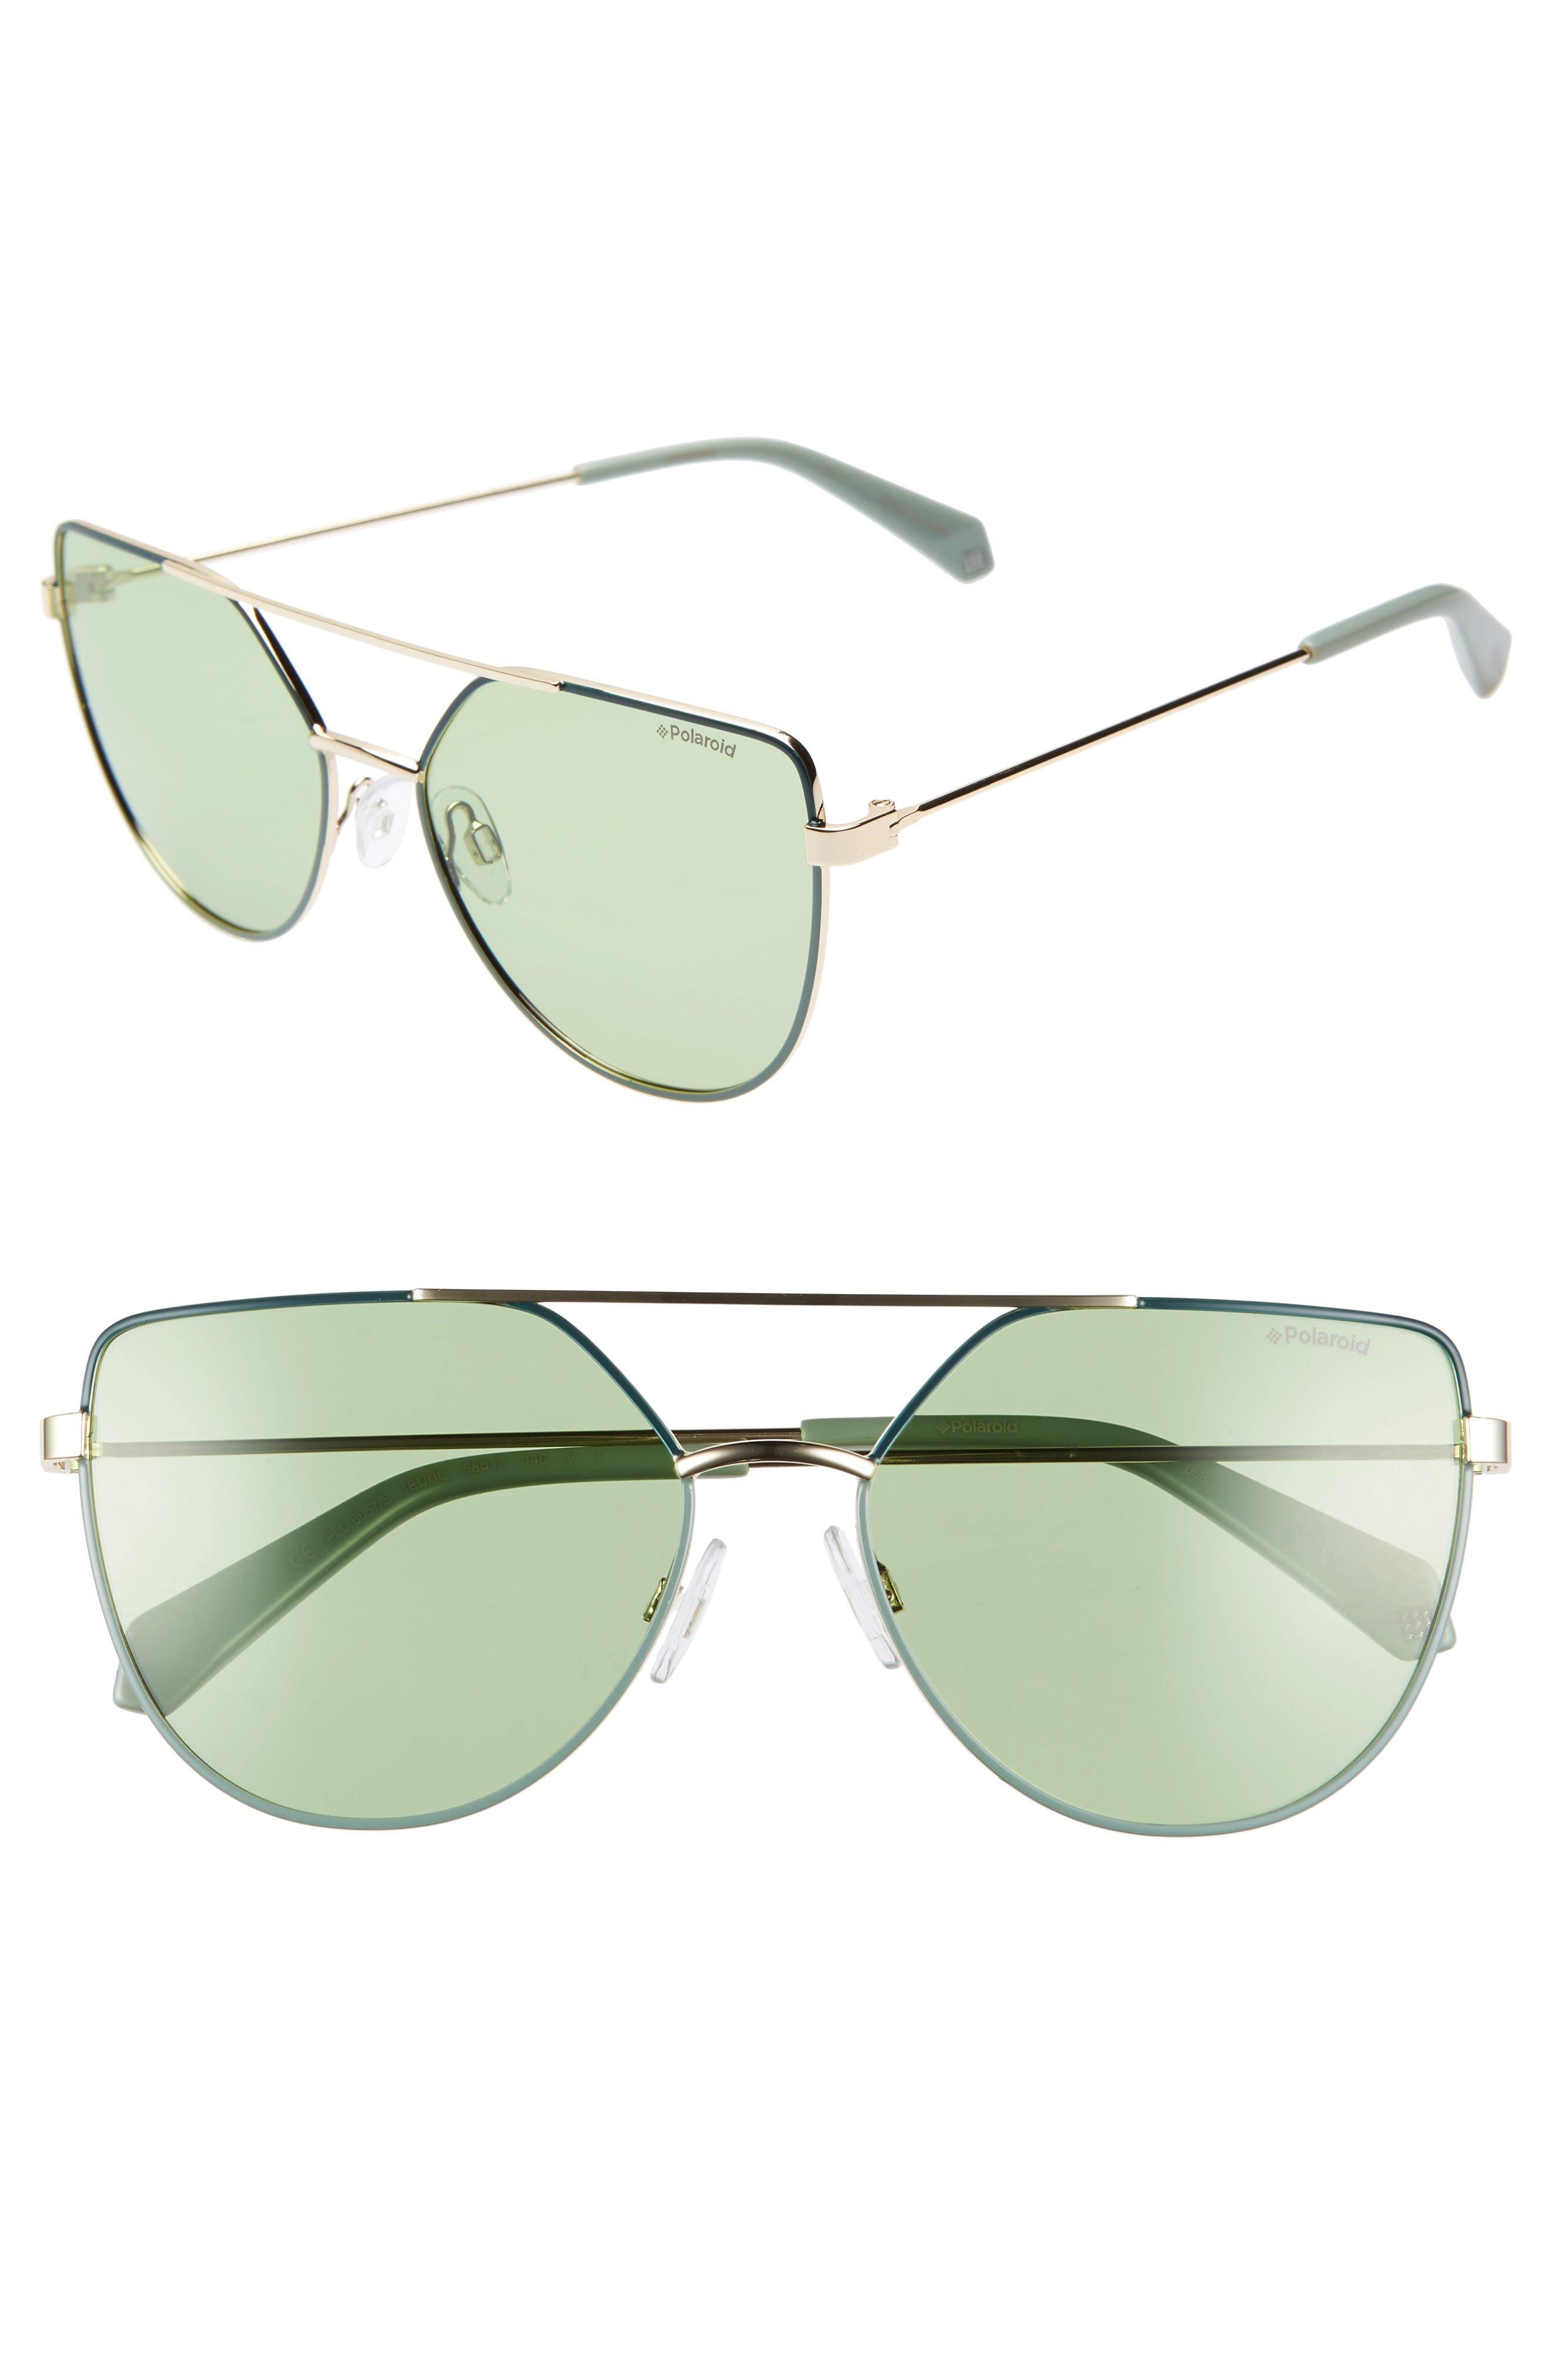 POLAROID 58Mm Polarized Sunglasses - Green/ Gold